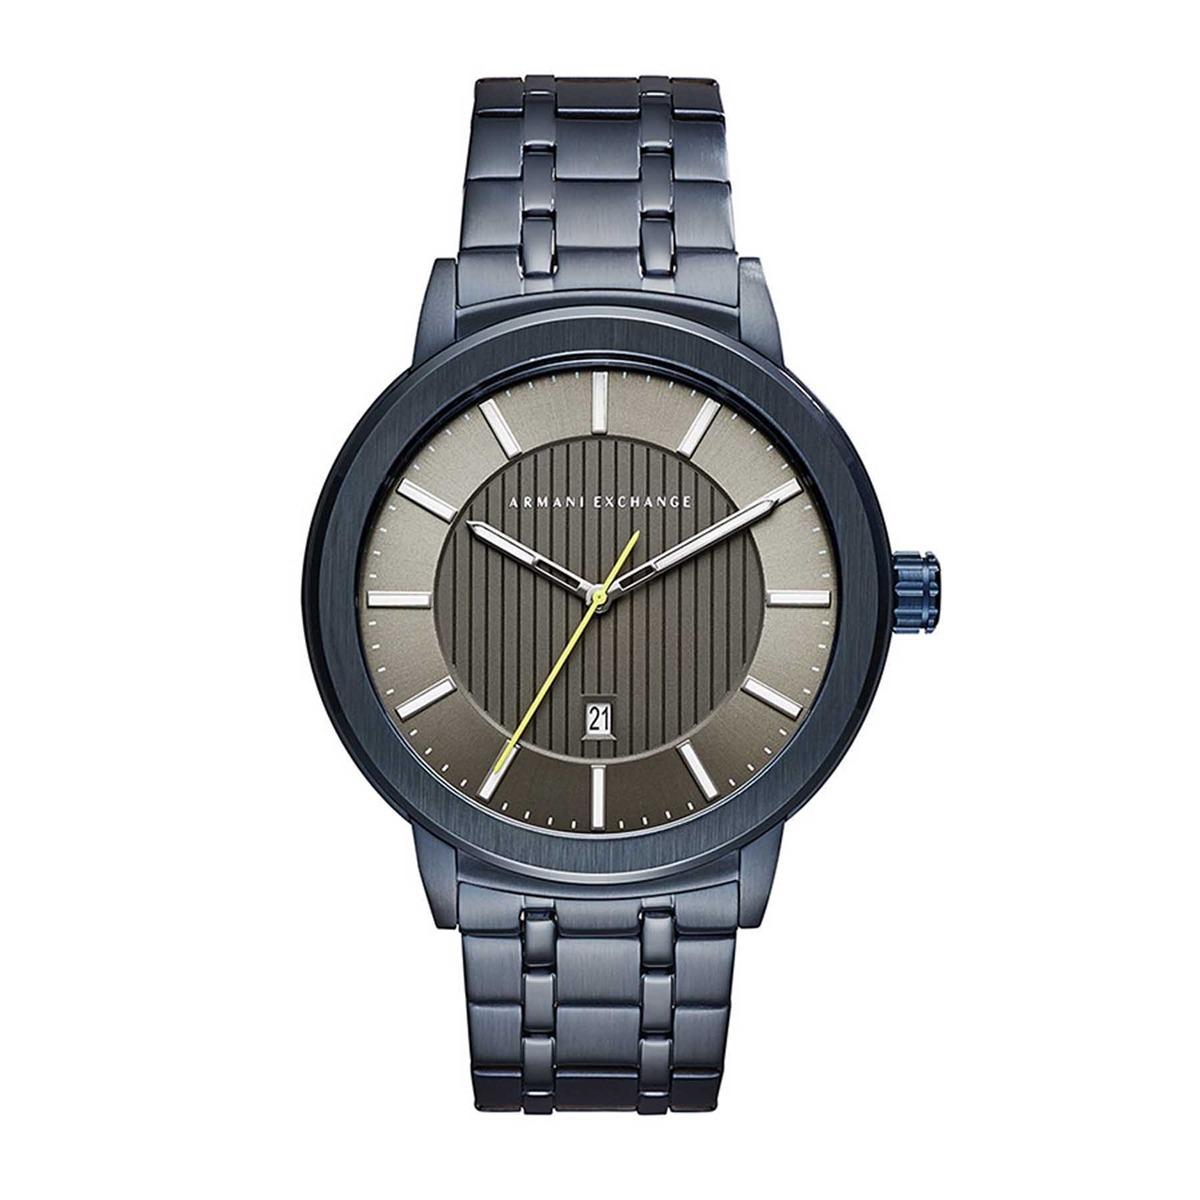 5c58a897c71 relógio armani exchange analógico masculino ax1458 4cn. Carregando zoom.